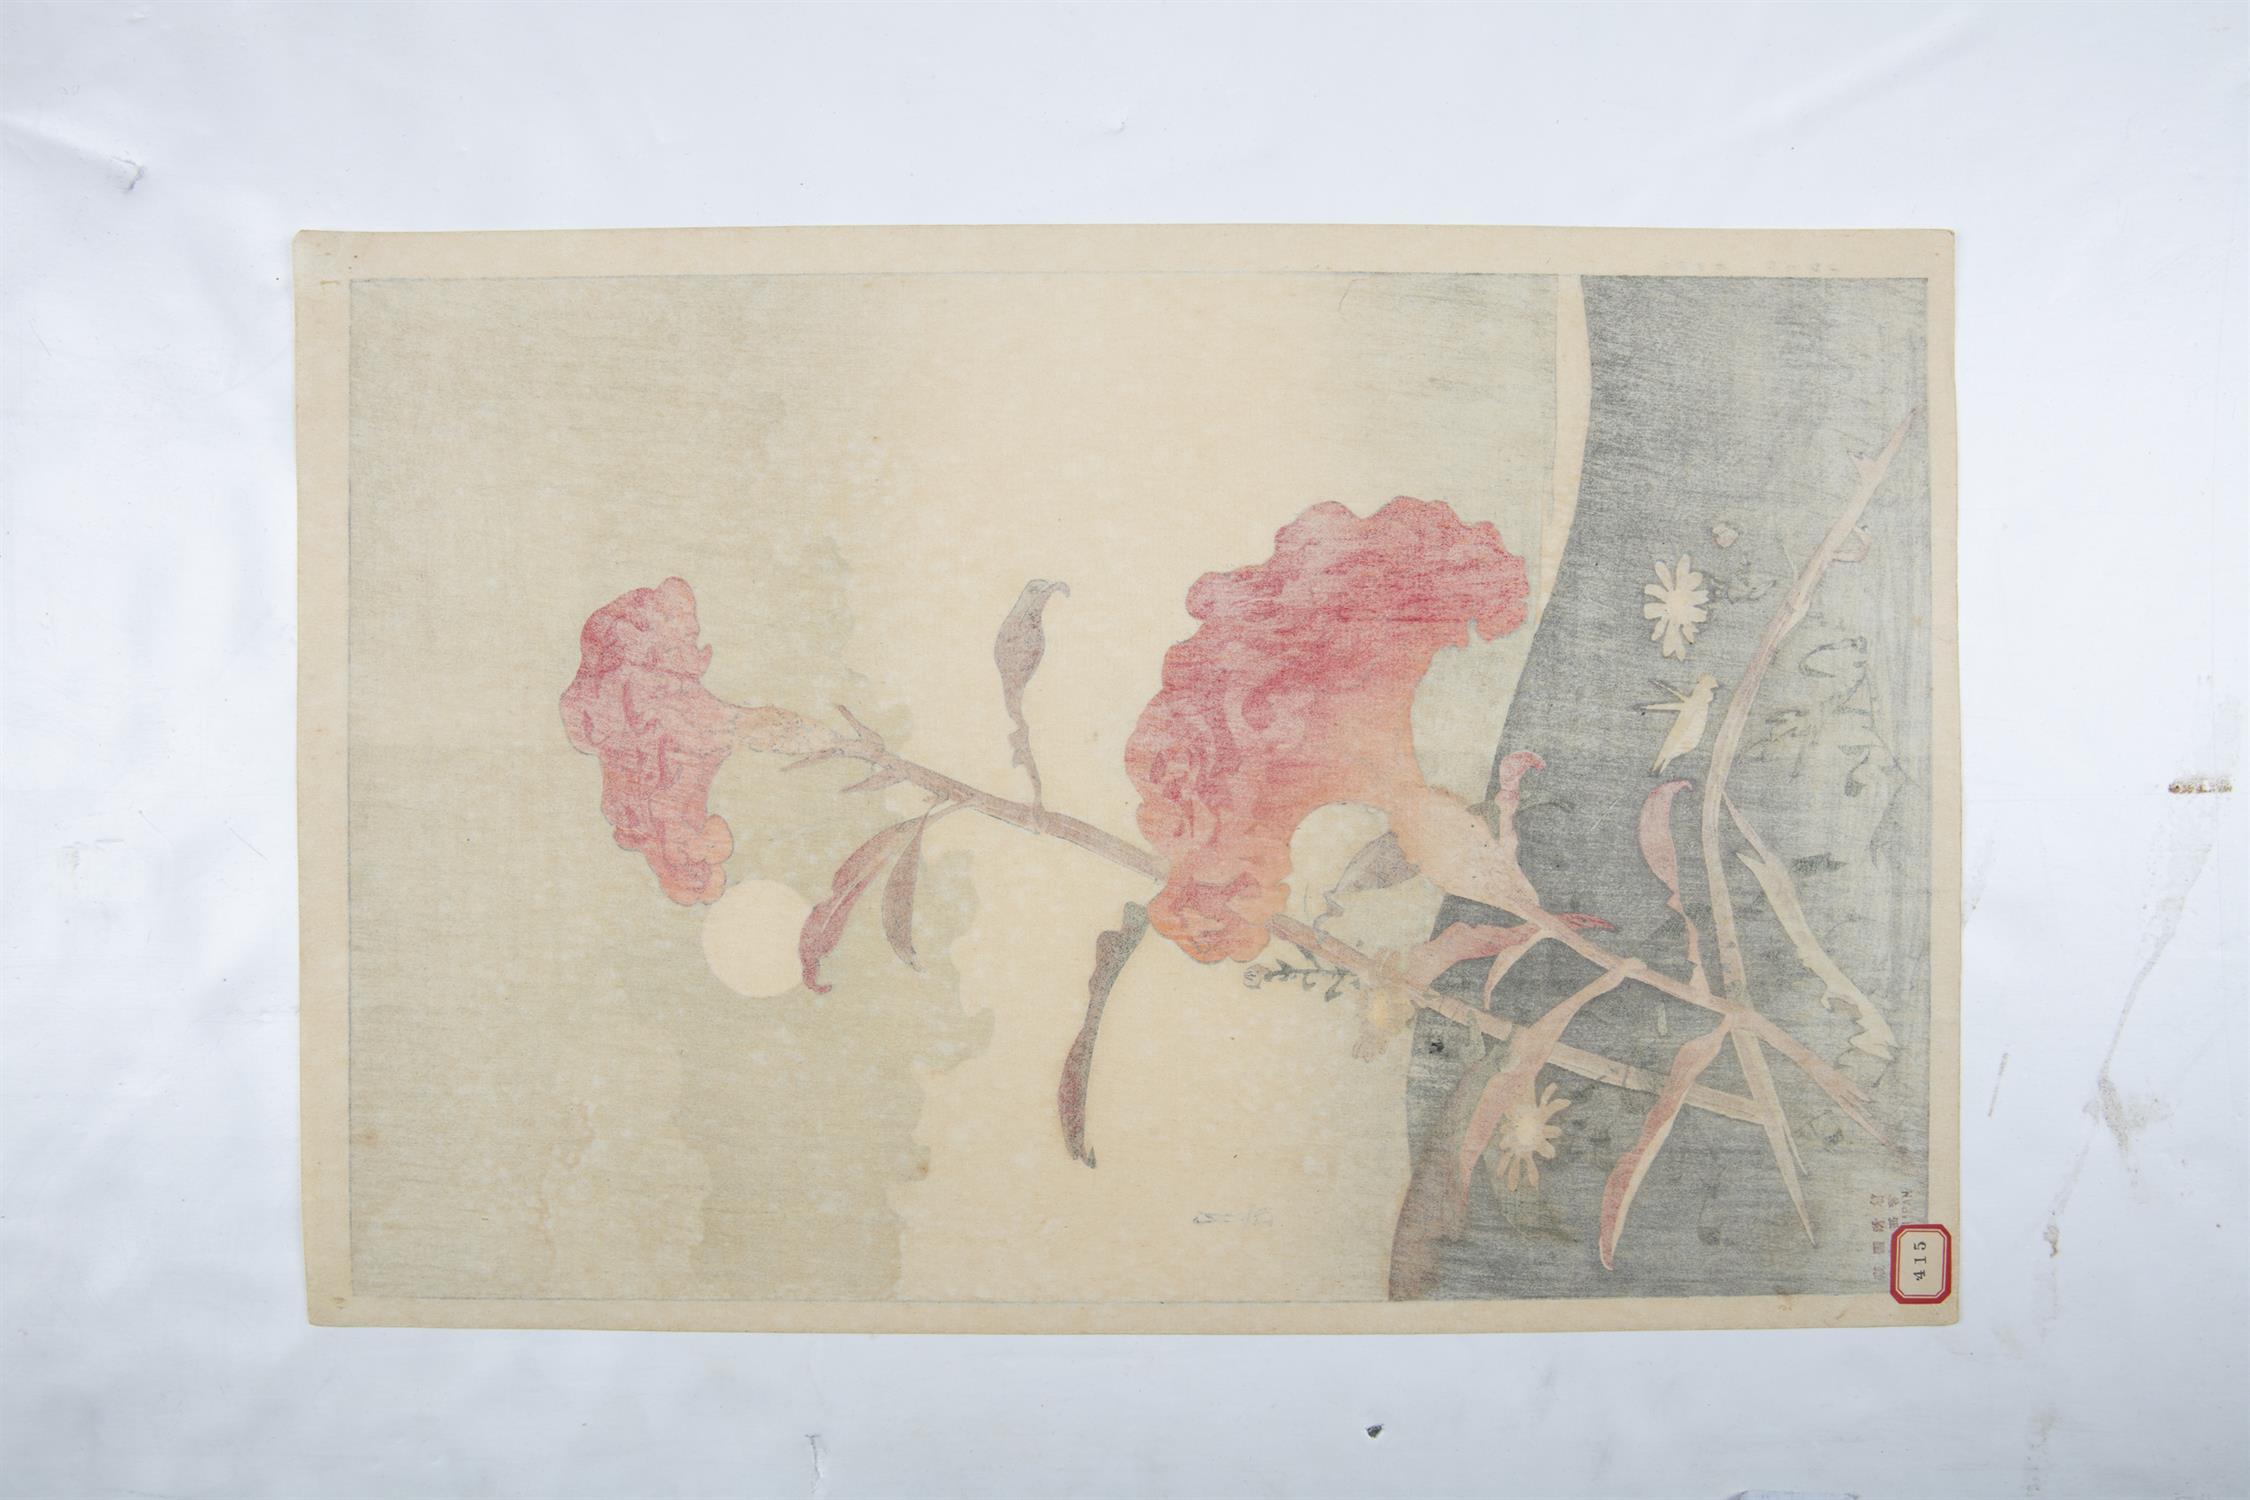 YOSHIMOTO GESSO 吉本月荘(1881-1936) Flowers and grasshopper Oban tata-e / woodblock print A print - Image 5 of 6